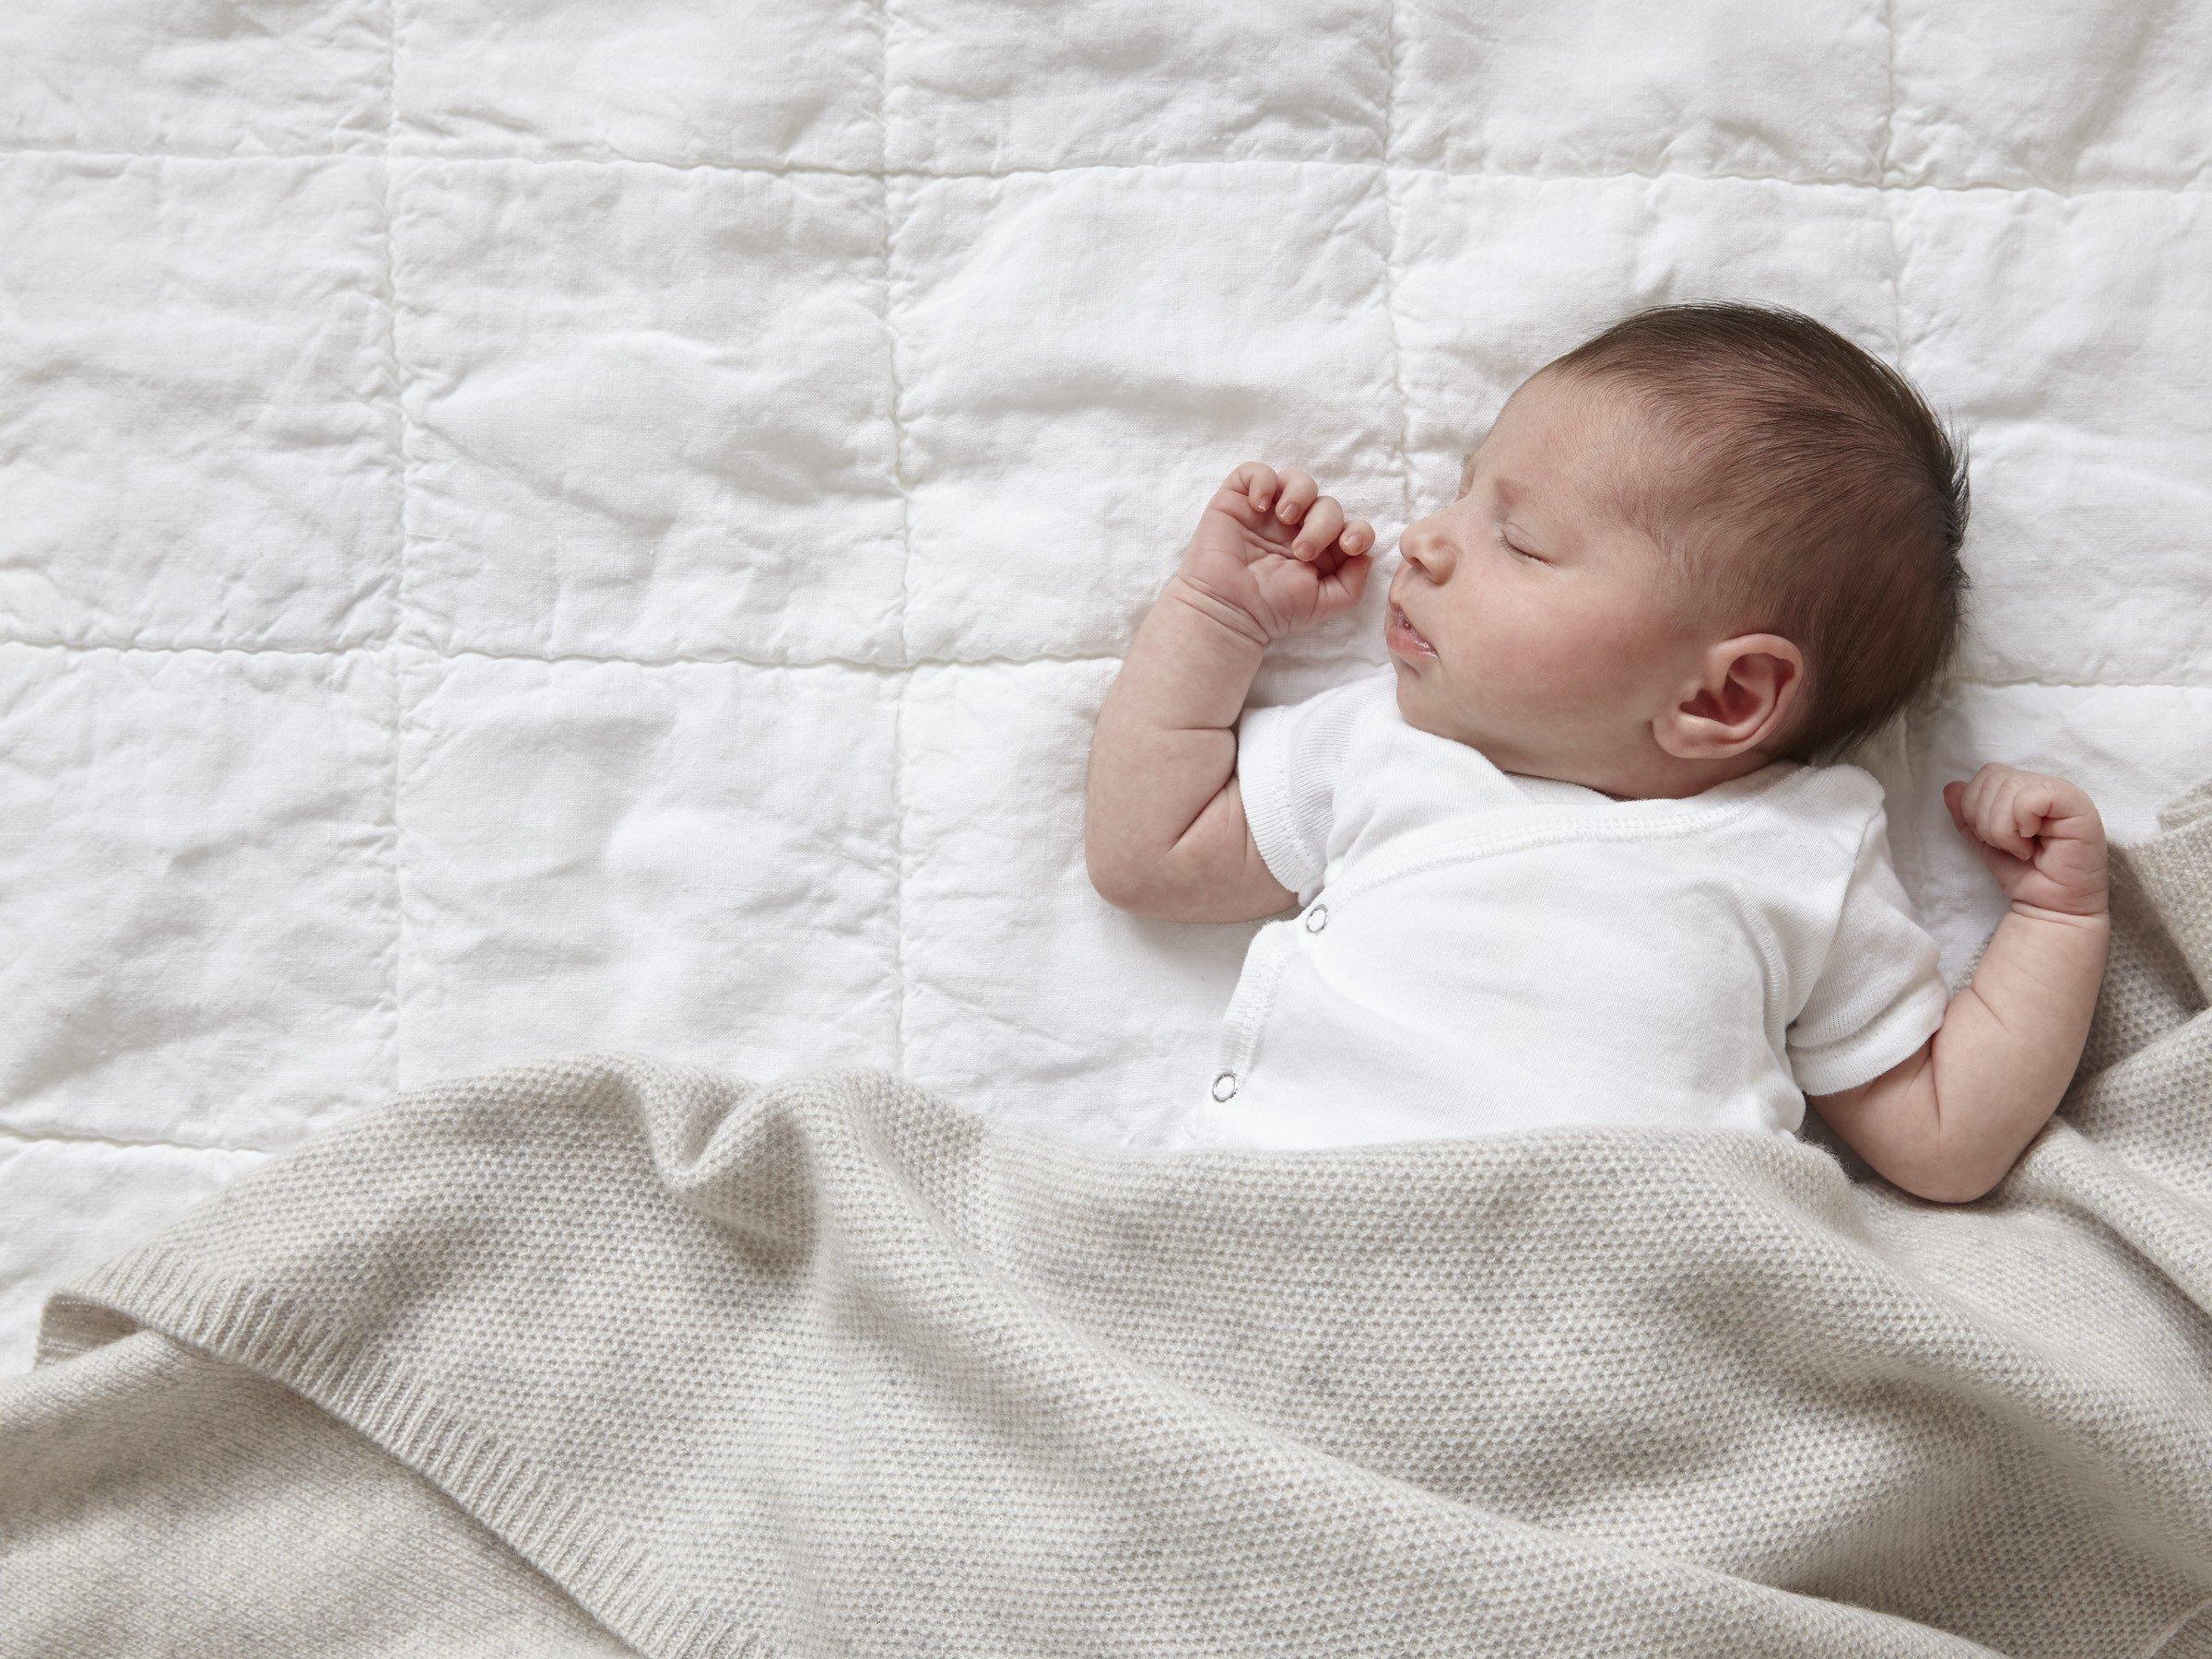 Comfort clipart baby blanket Parachute Blanket Baby Home Blanket